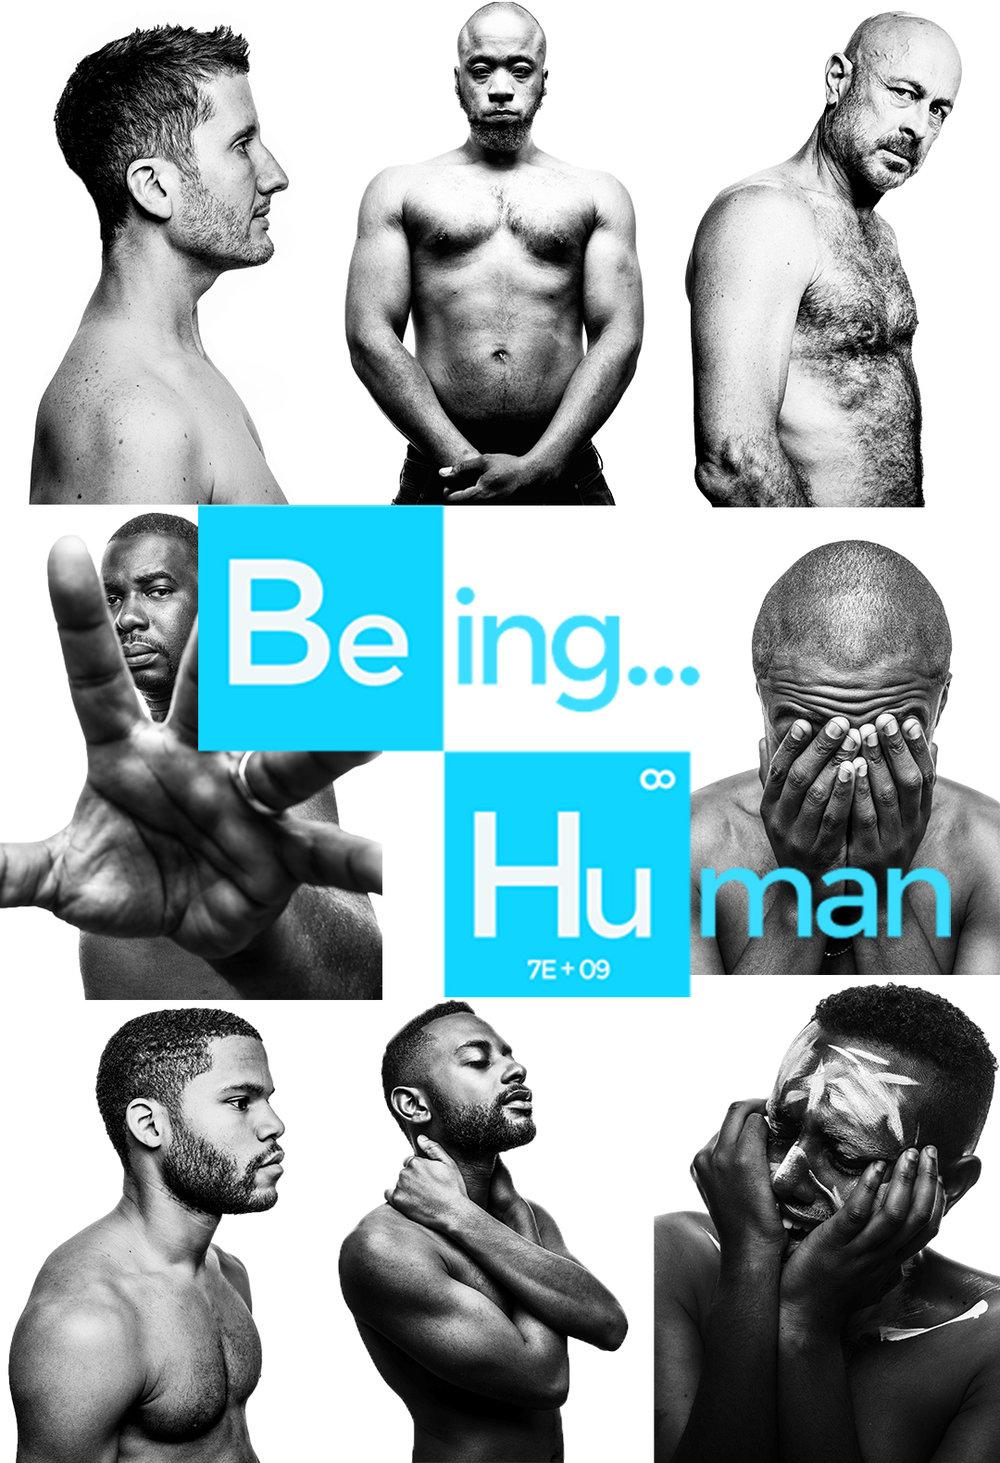 Being_Human_Social_media.jpg